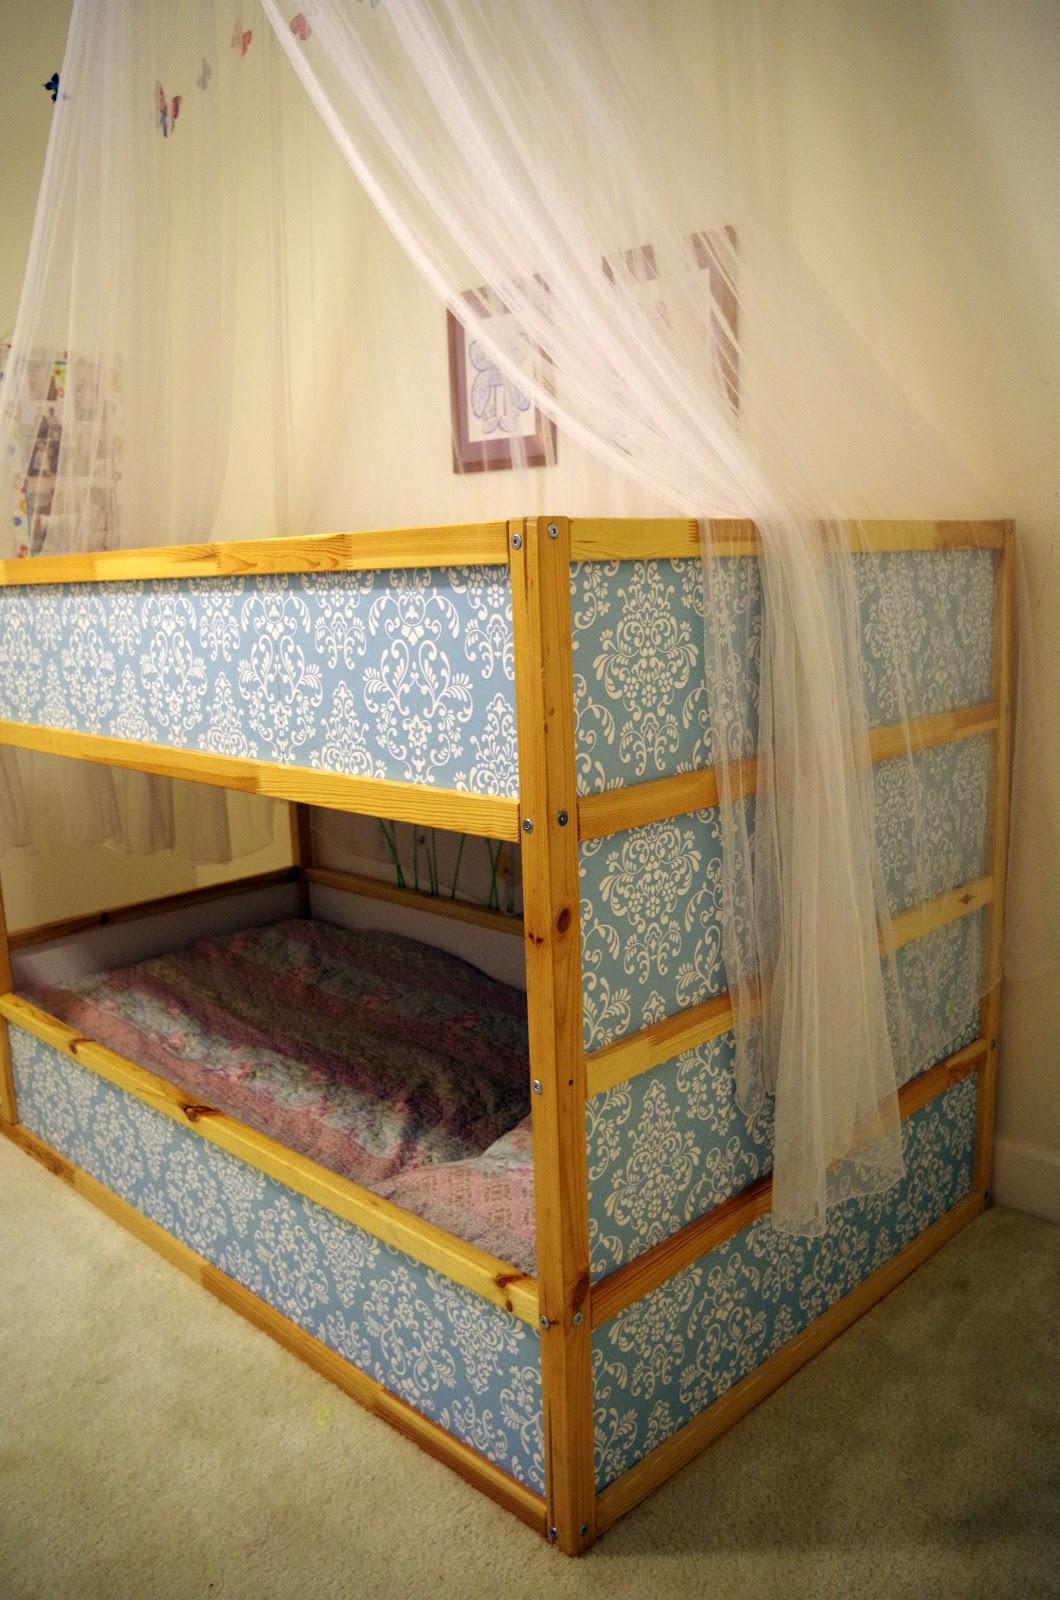 Full Size of Kura Hack Ikea Bed Storage Floor Montessori House Stairs Ideas Rebekahs Web Log Pinterest Party Wohnzimmer Kura Hack